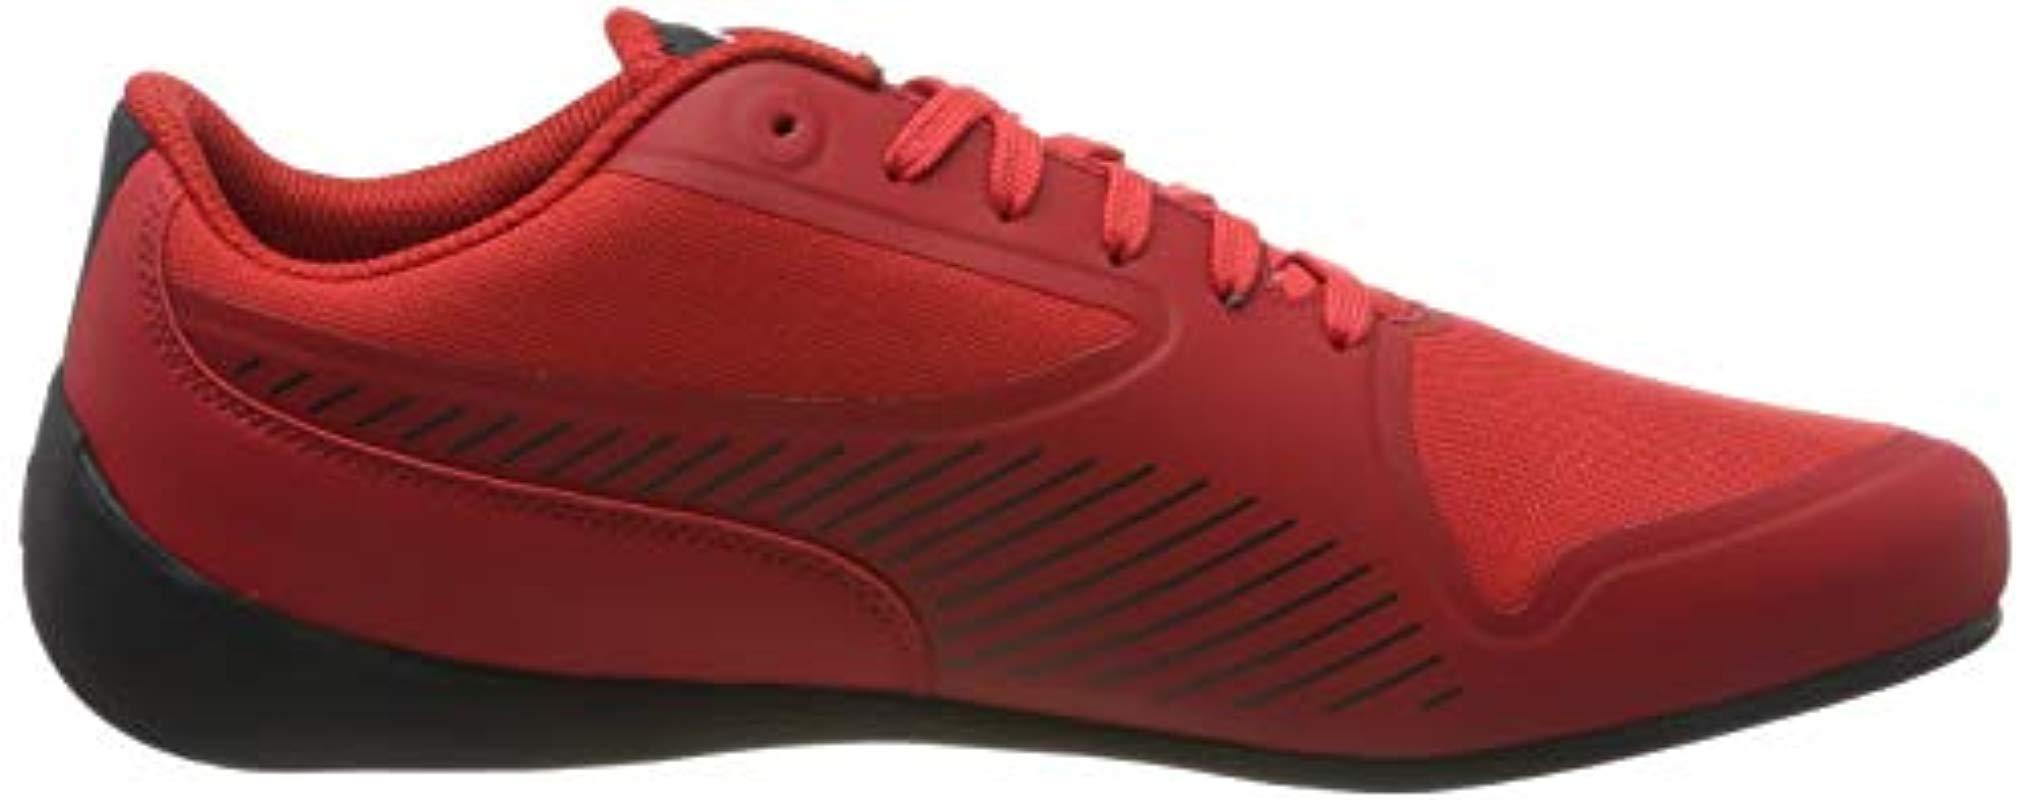 PUMA Unisex Adults/' Sf Drift Cat 7 Low-Top Sneakers